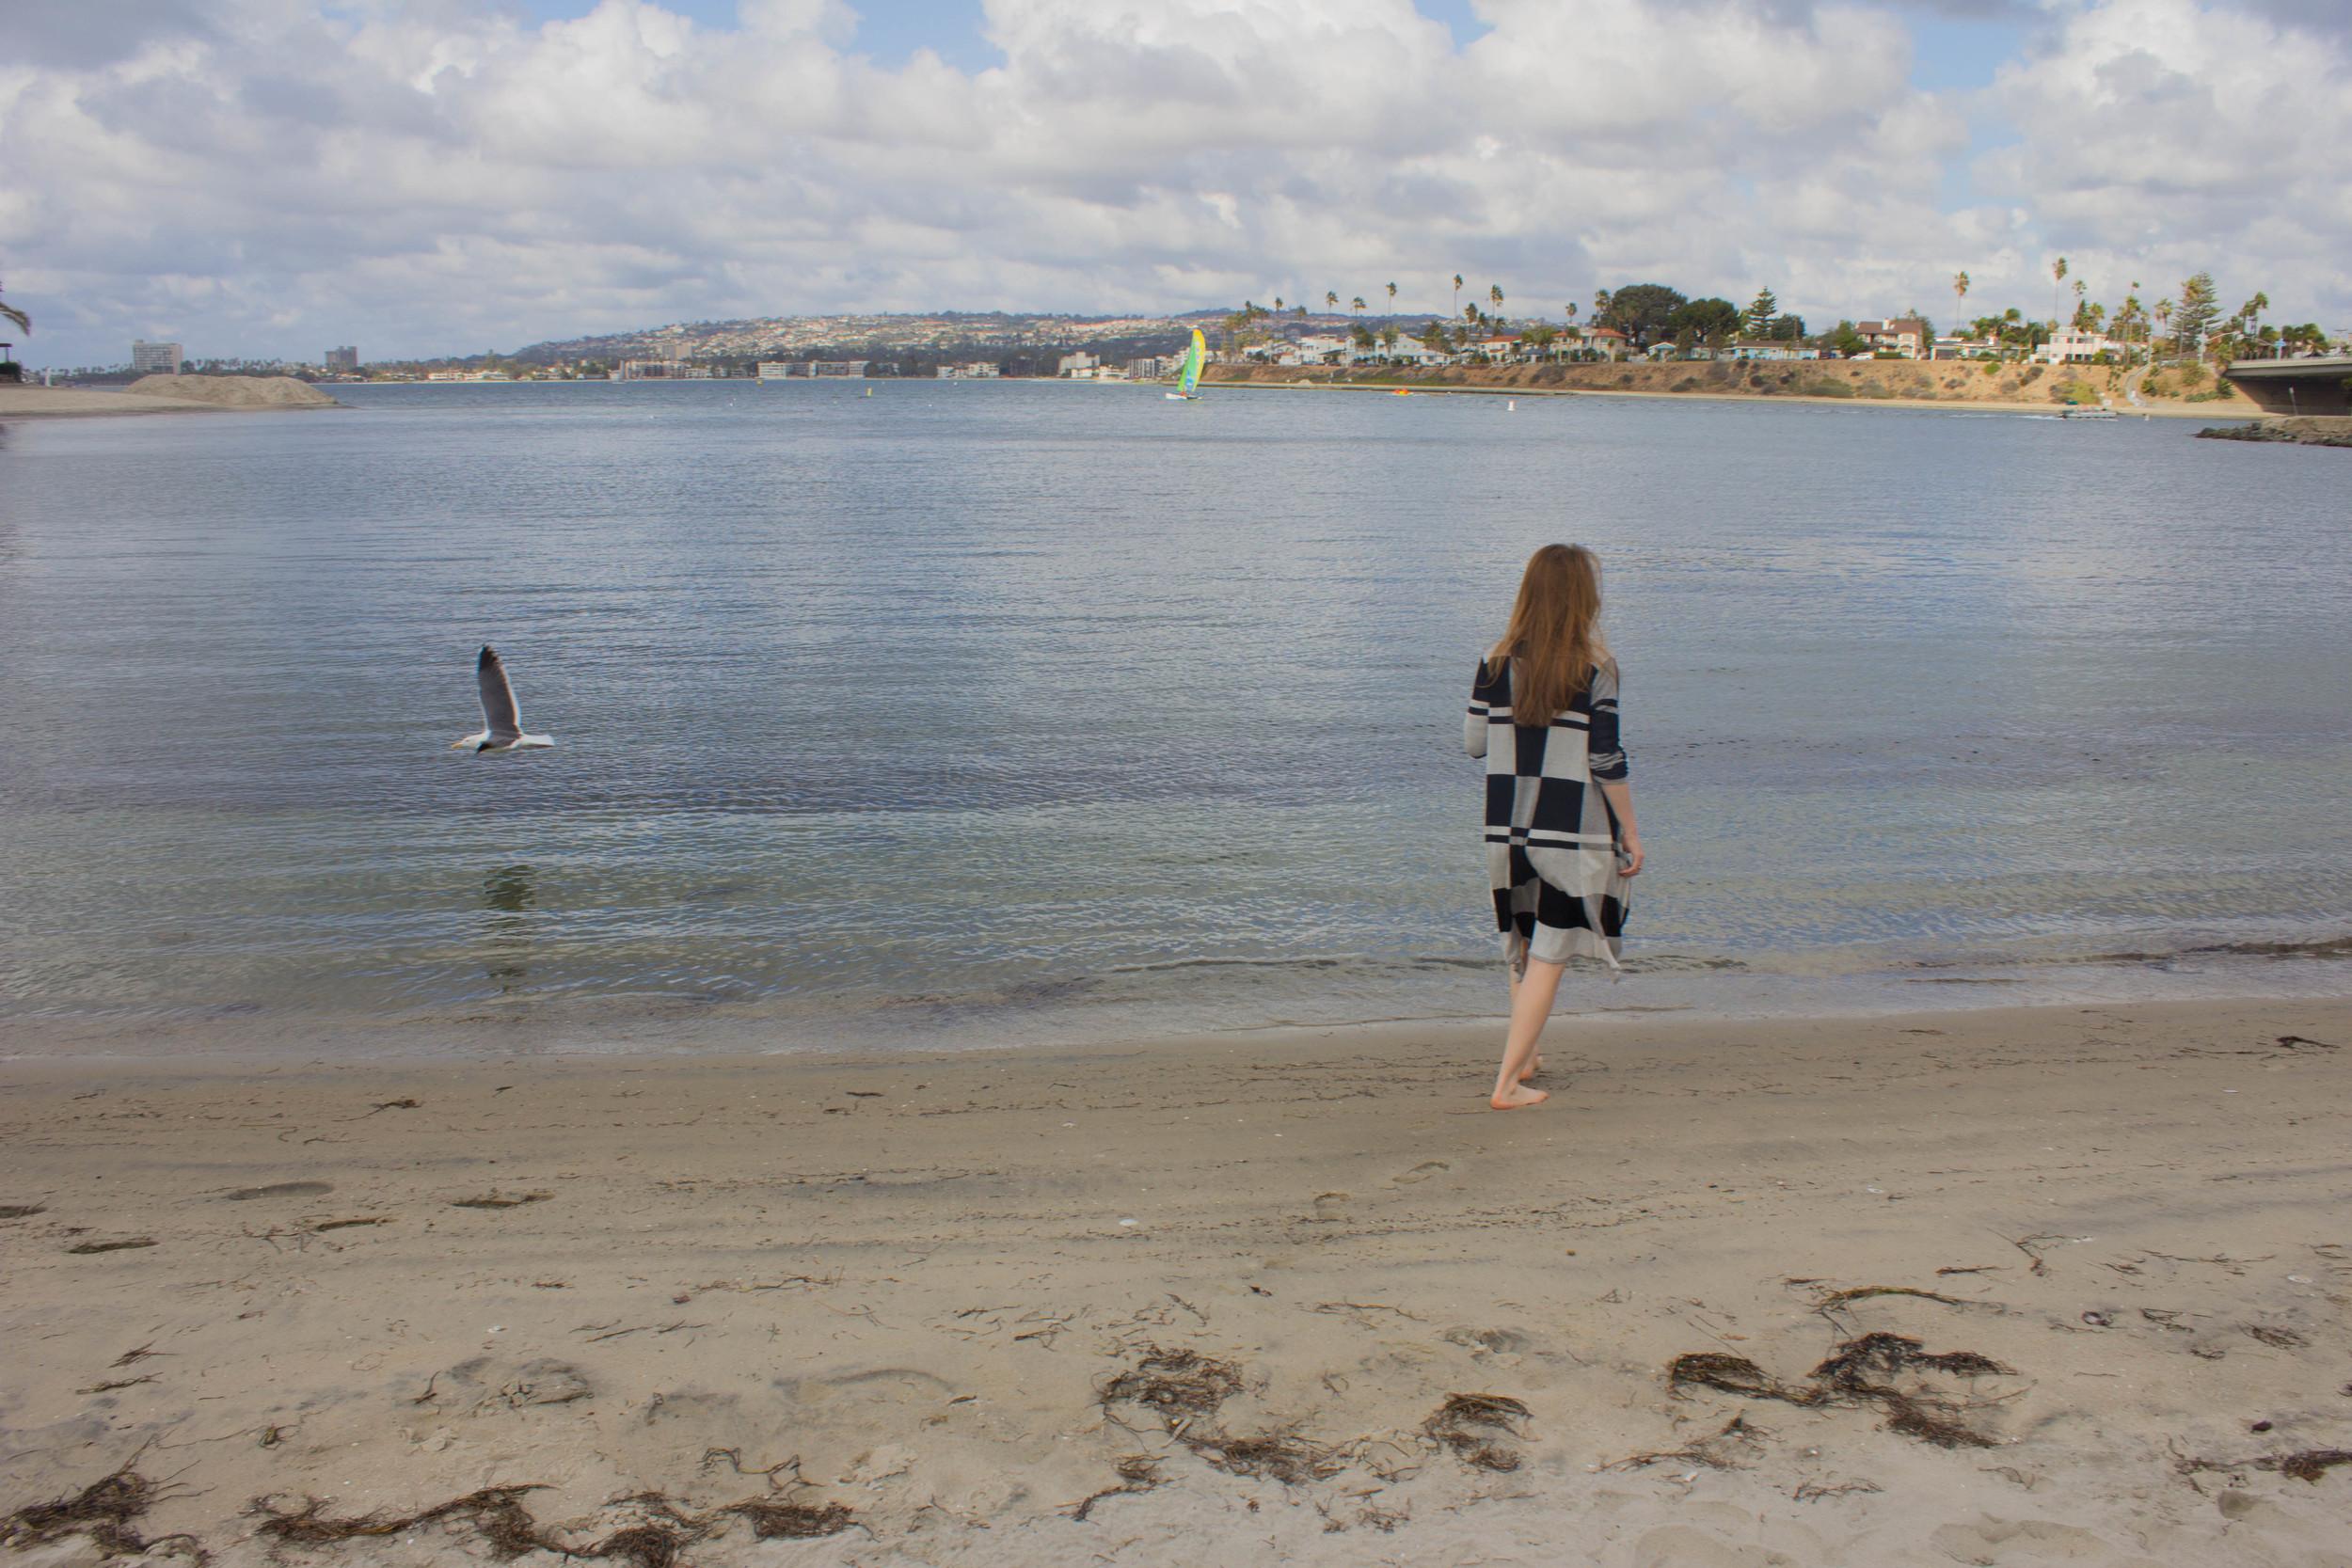 paradise point resort, san diego, california